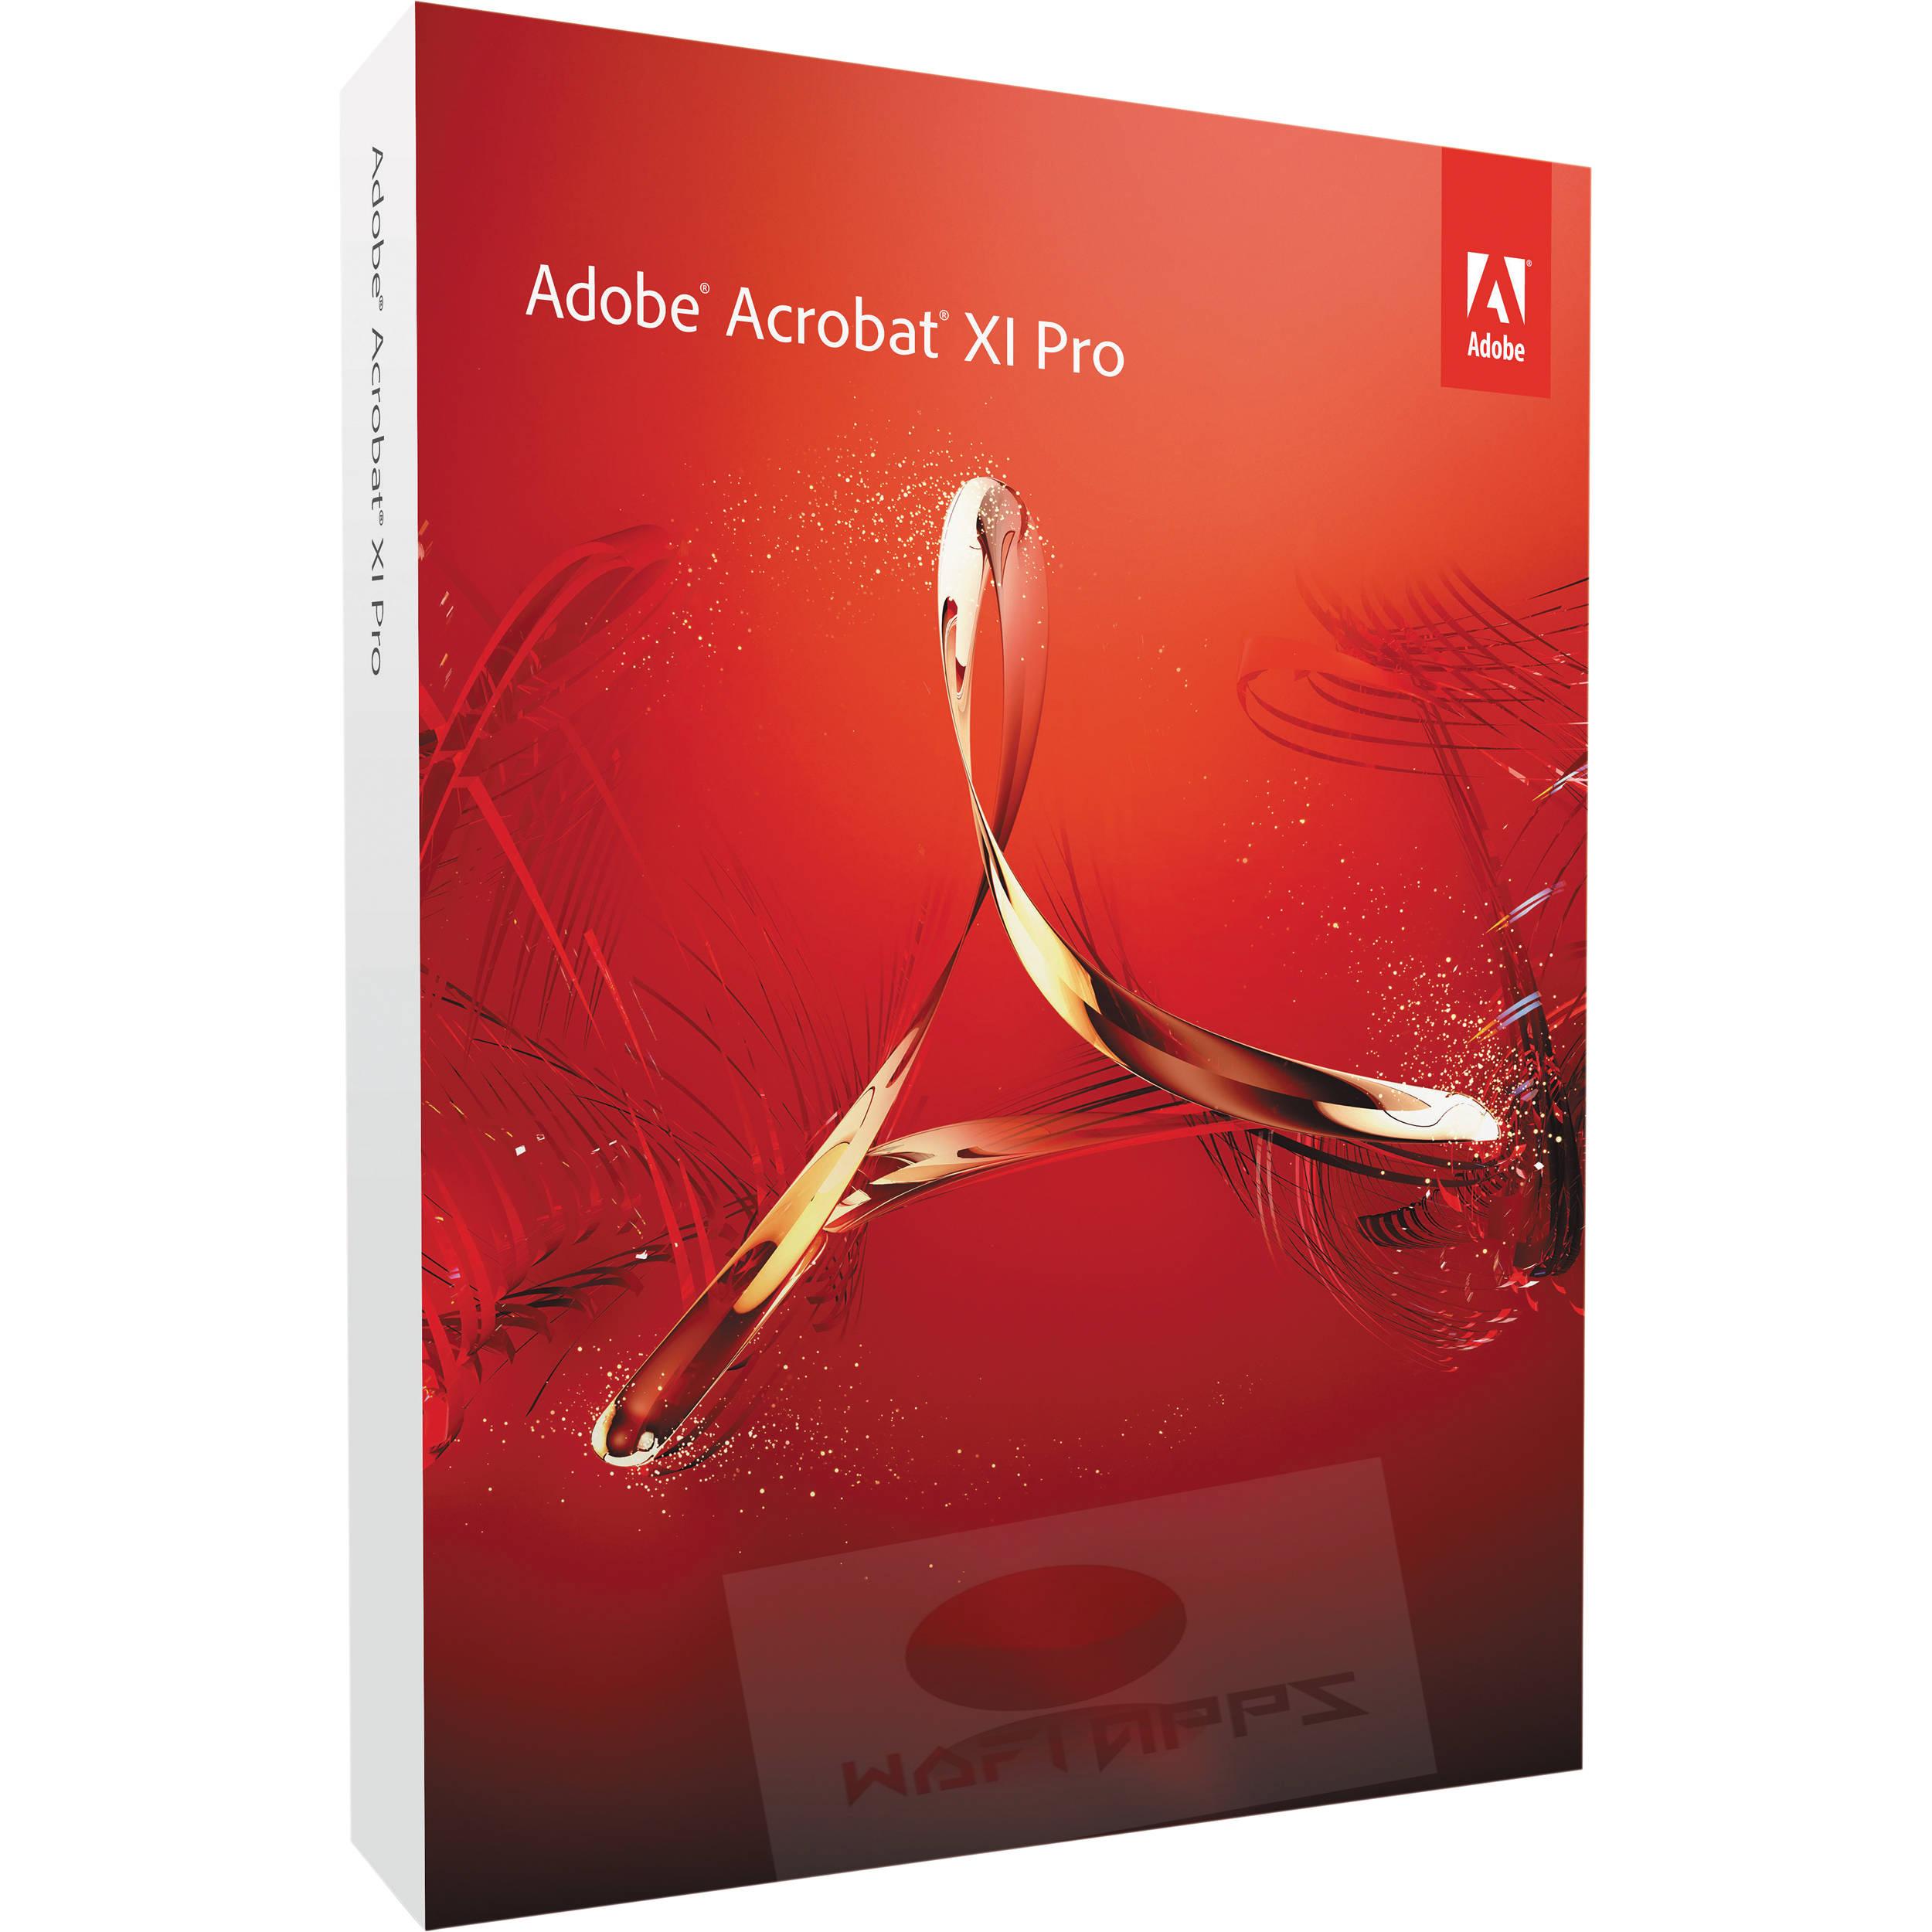 wafiapps.net-Adobe Acrobat XI Pro